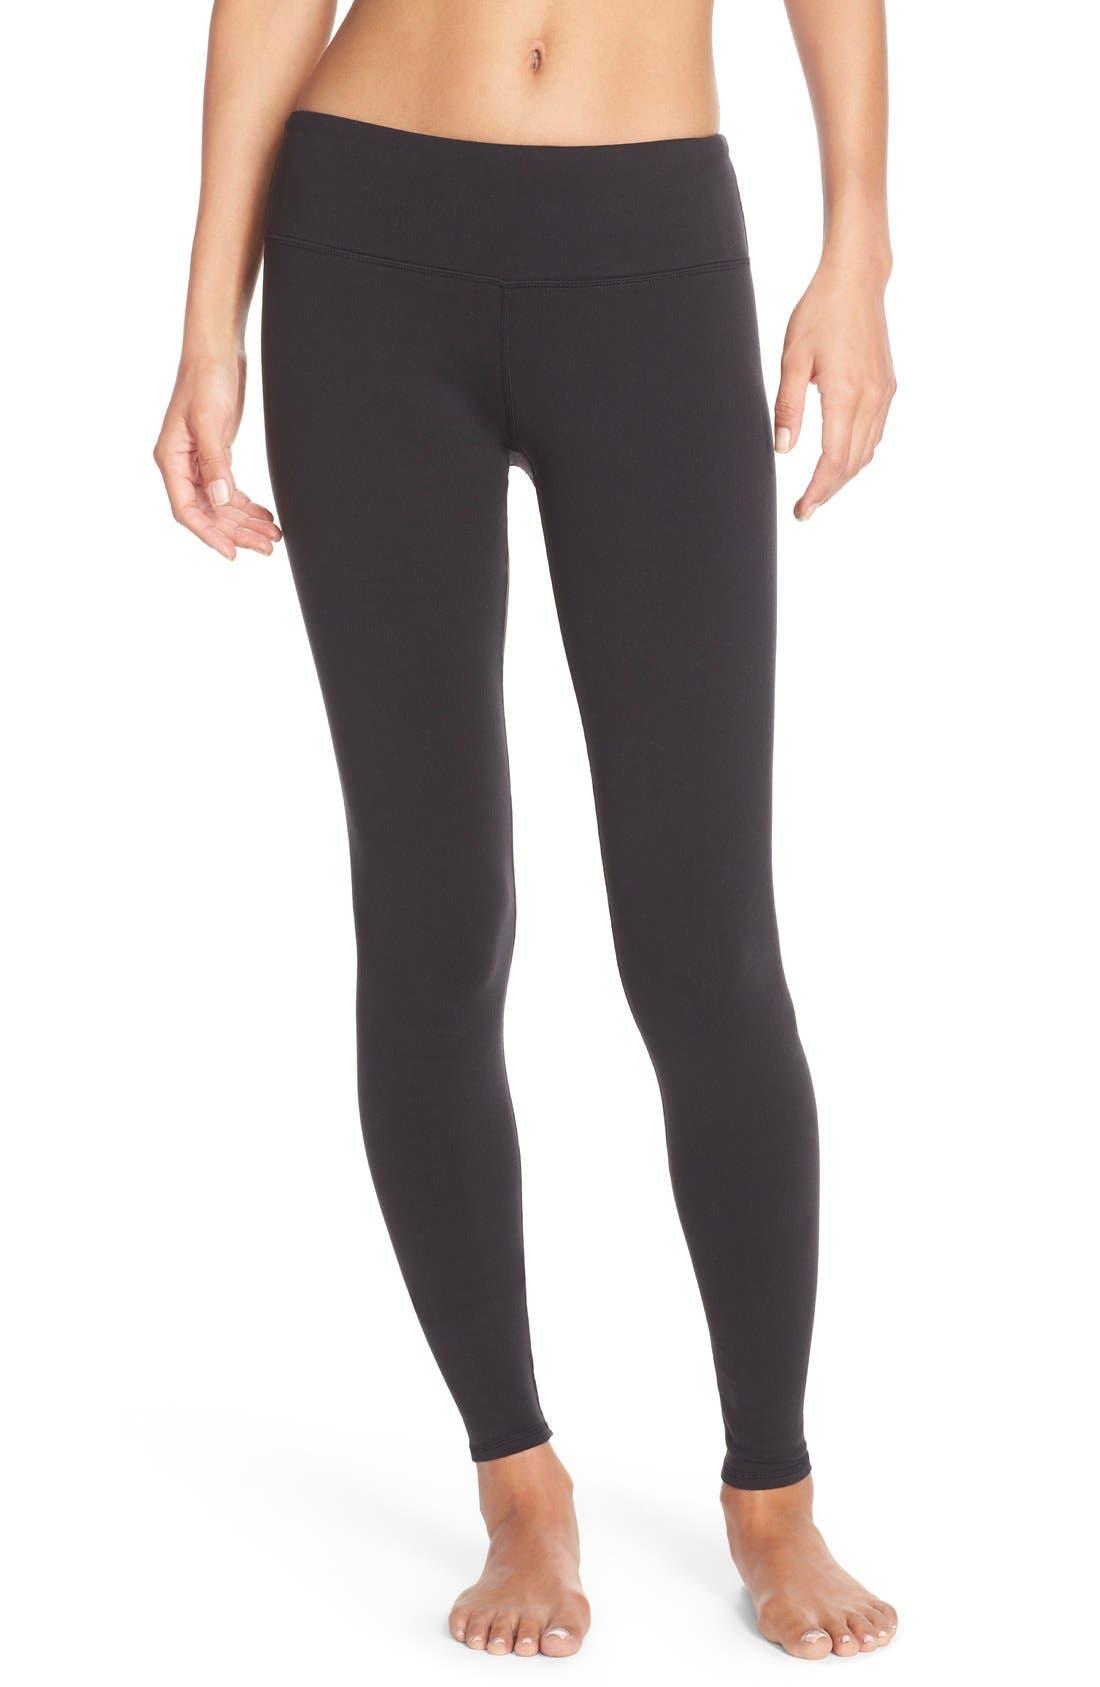 Main Image - Alo Airbrushed Glossy Leggings